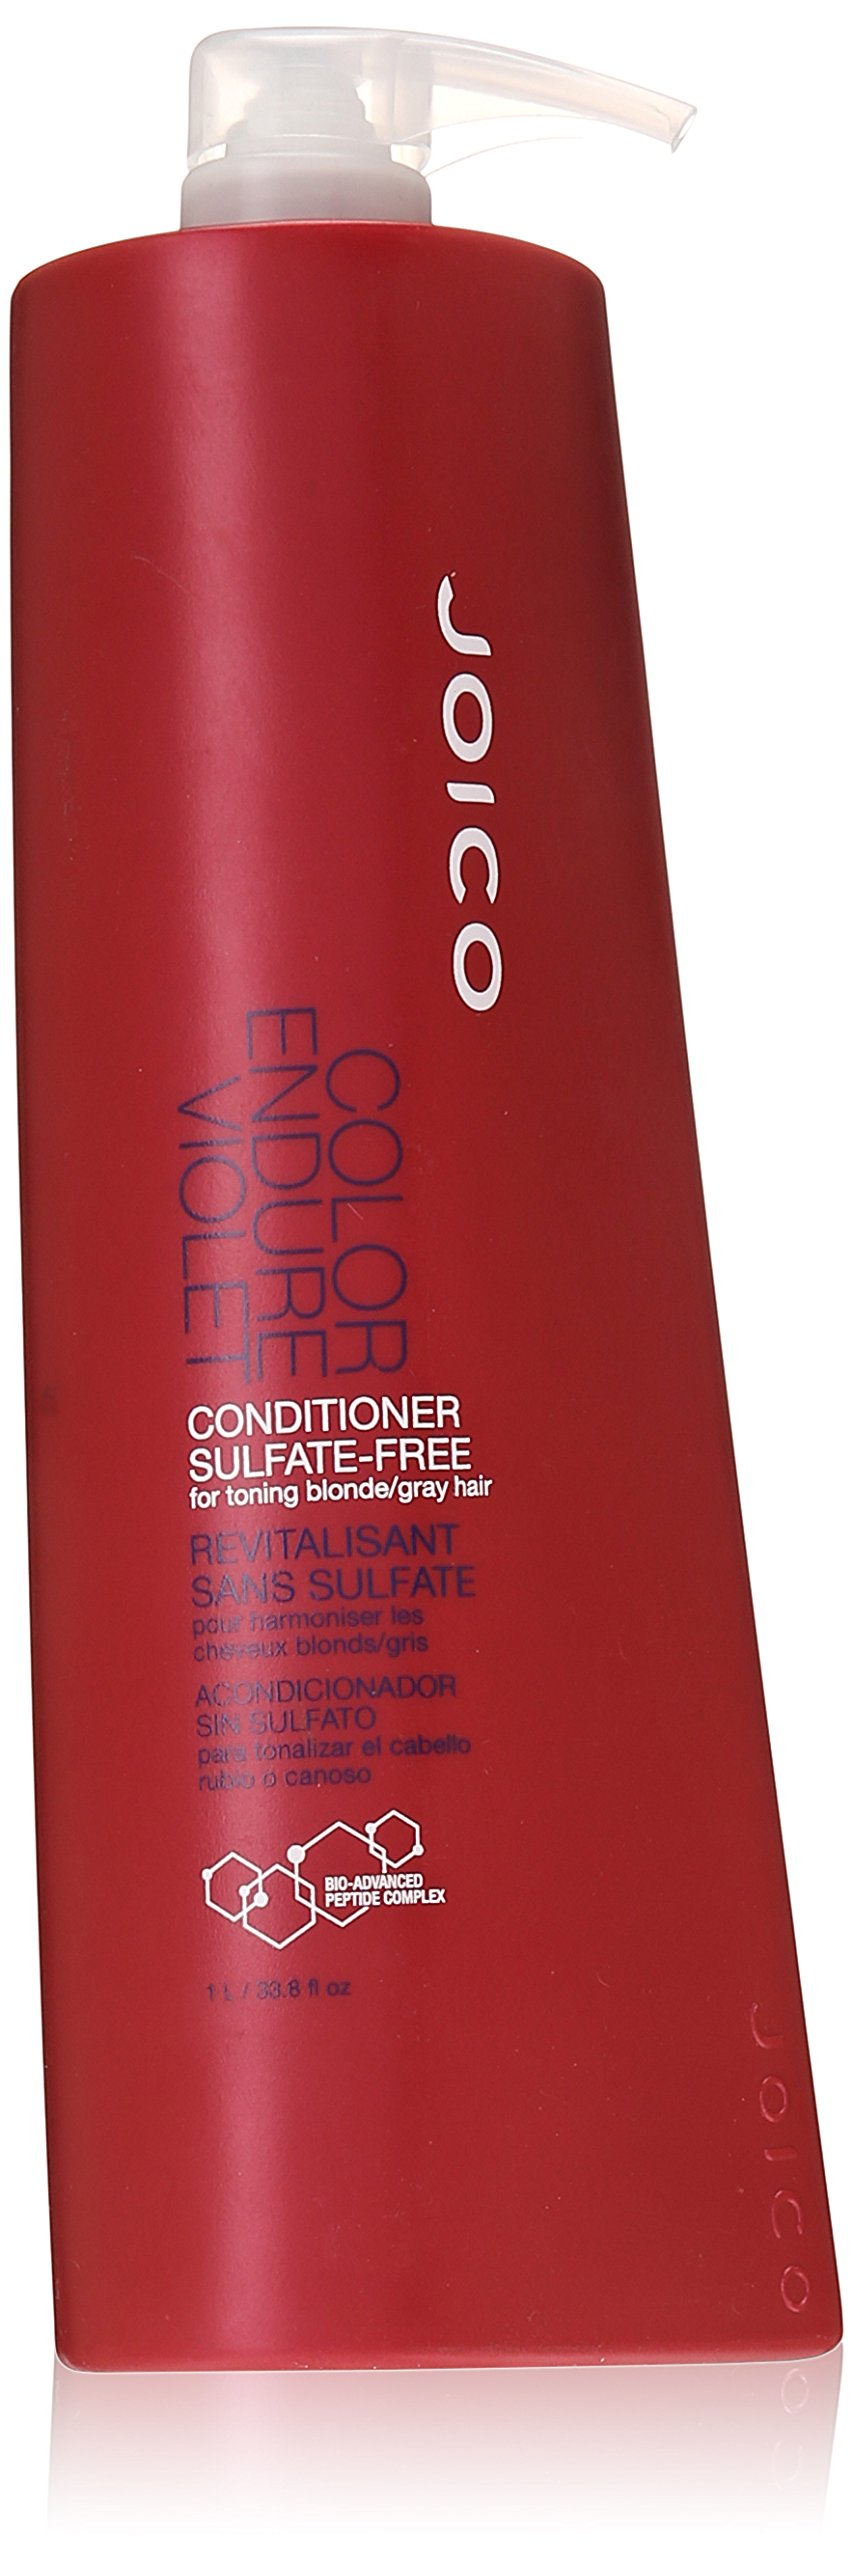 Joico Color Endure Violet Conditioner, 33.8 Ounce